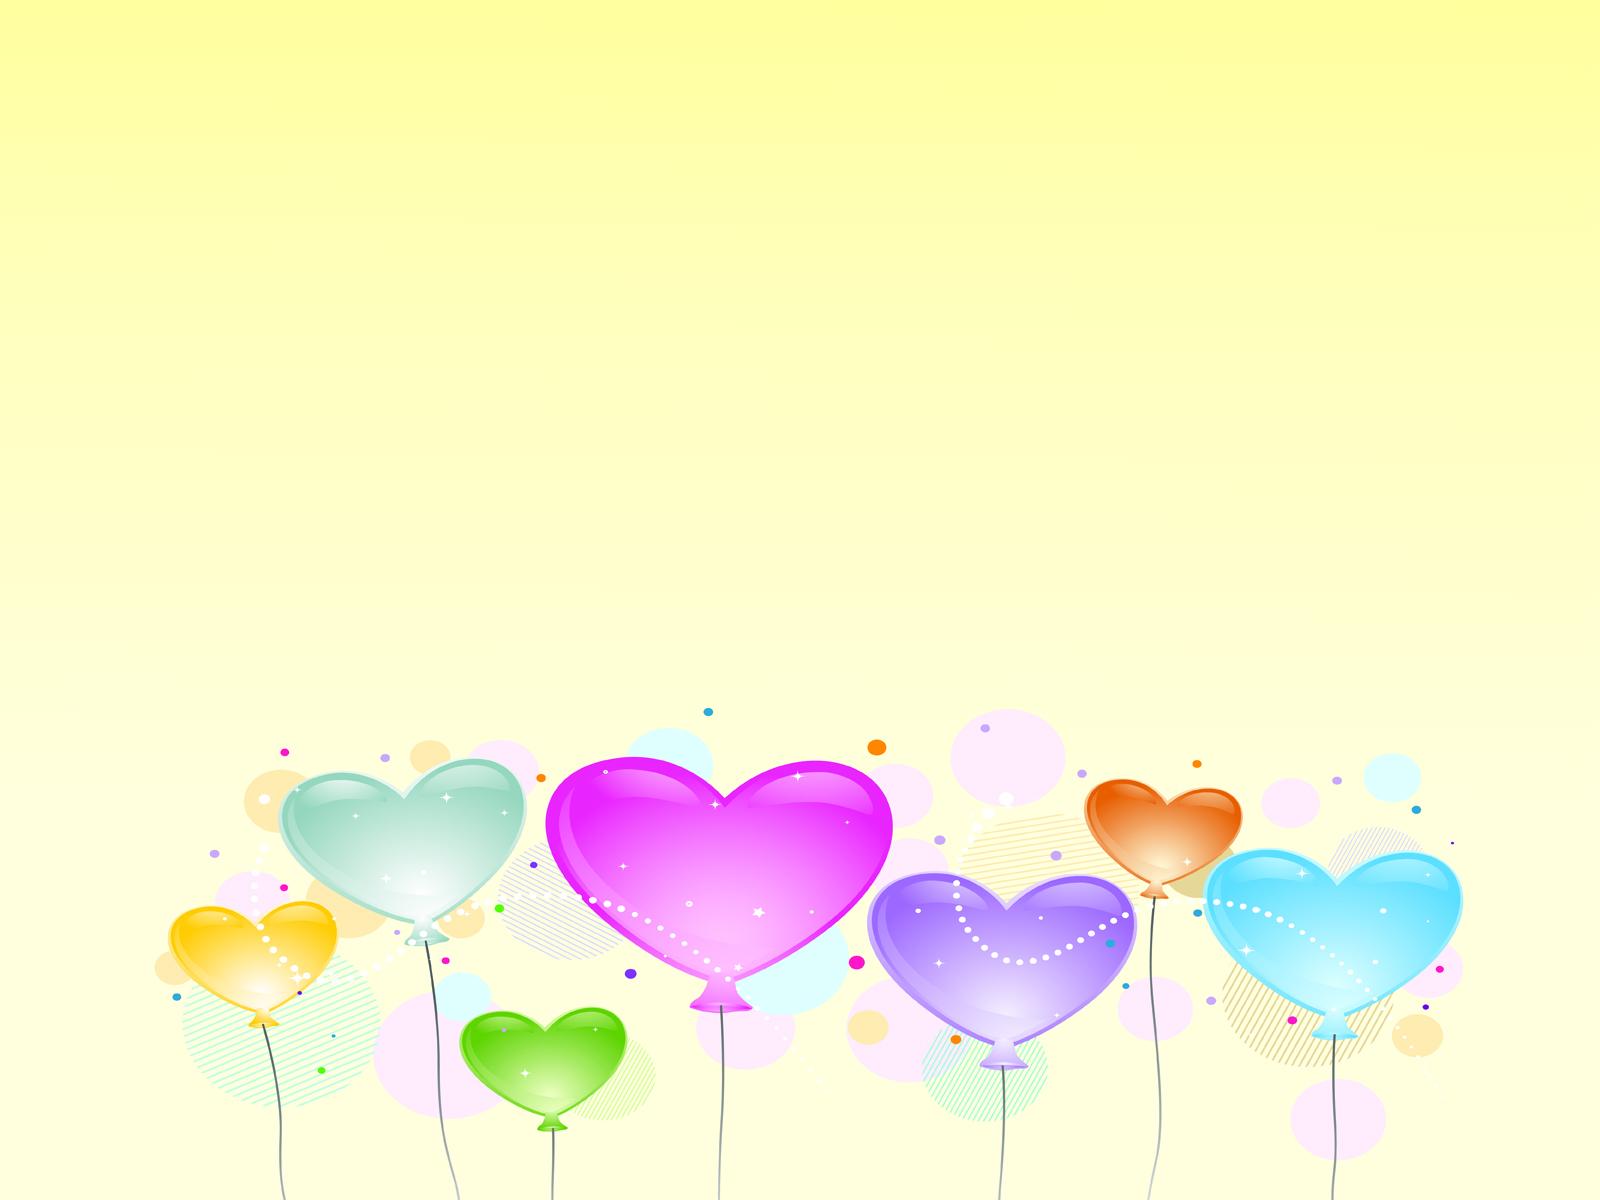 Clip art Love Balloons Backgrounds.